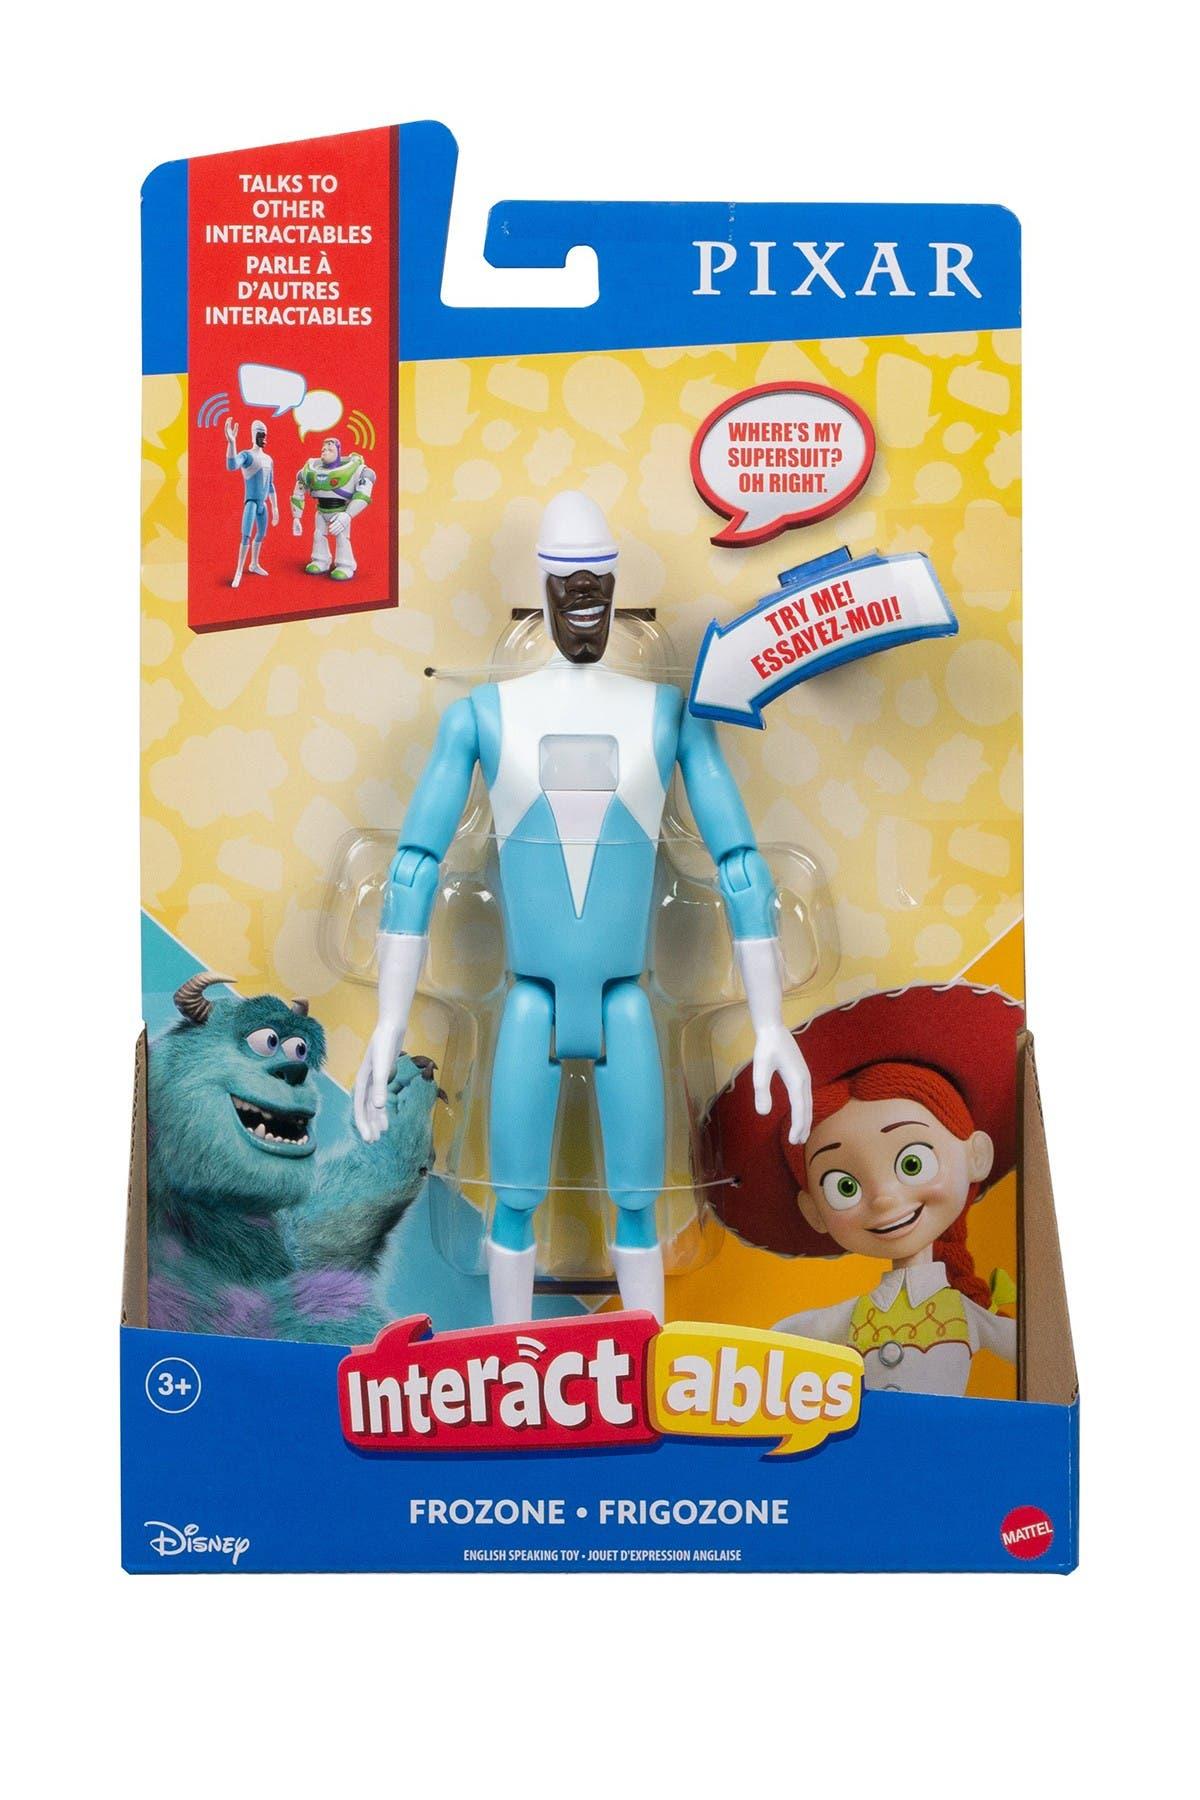 Image of Mattel Pixar Interactables Frozone Figure